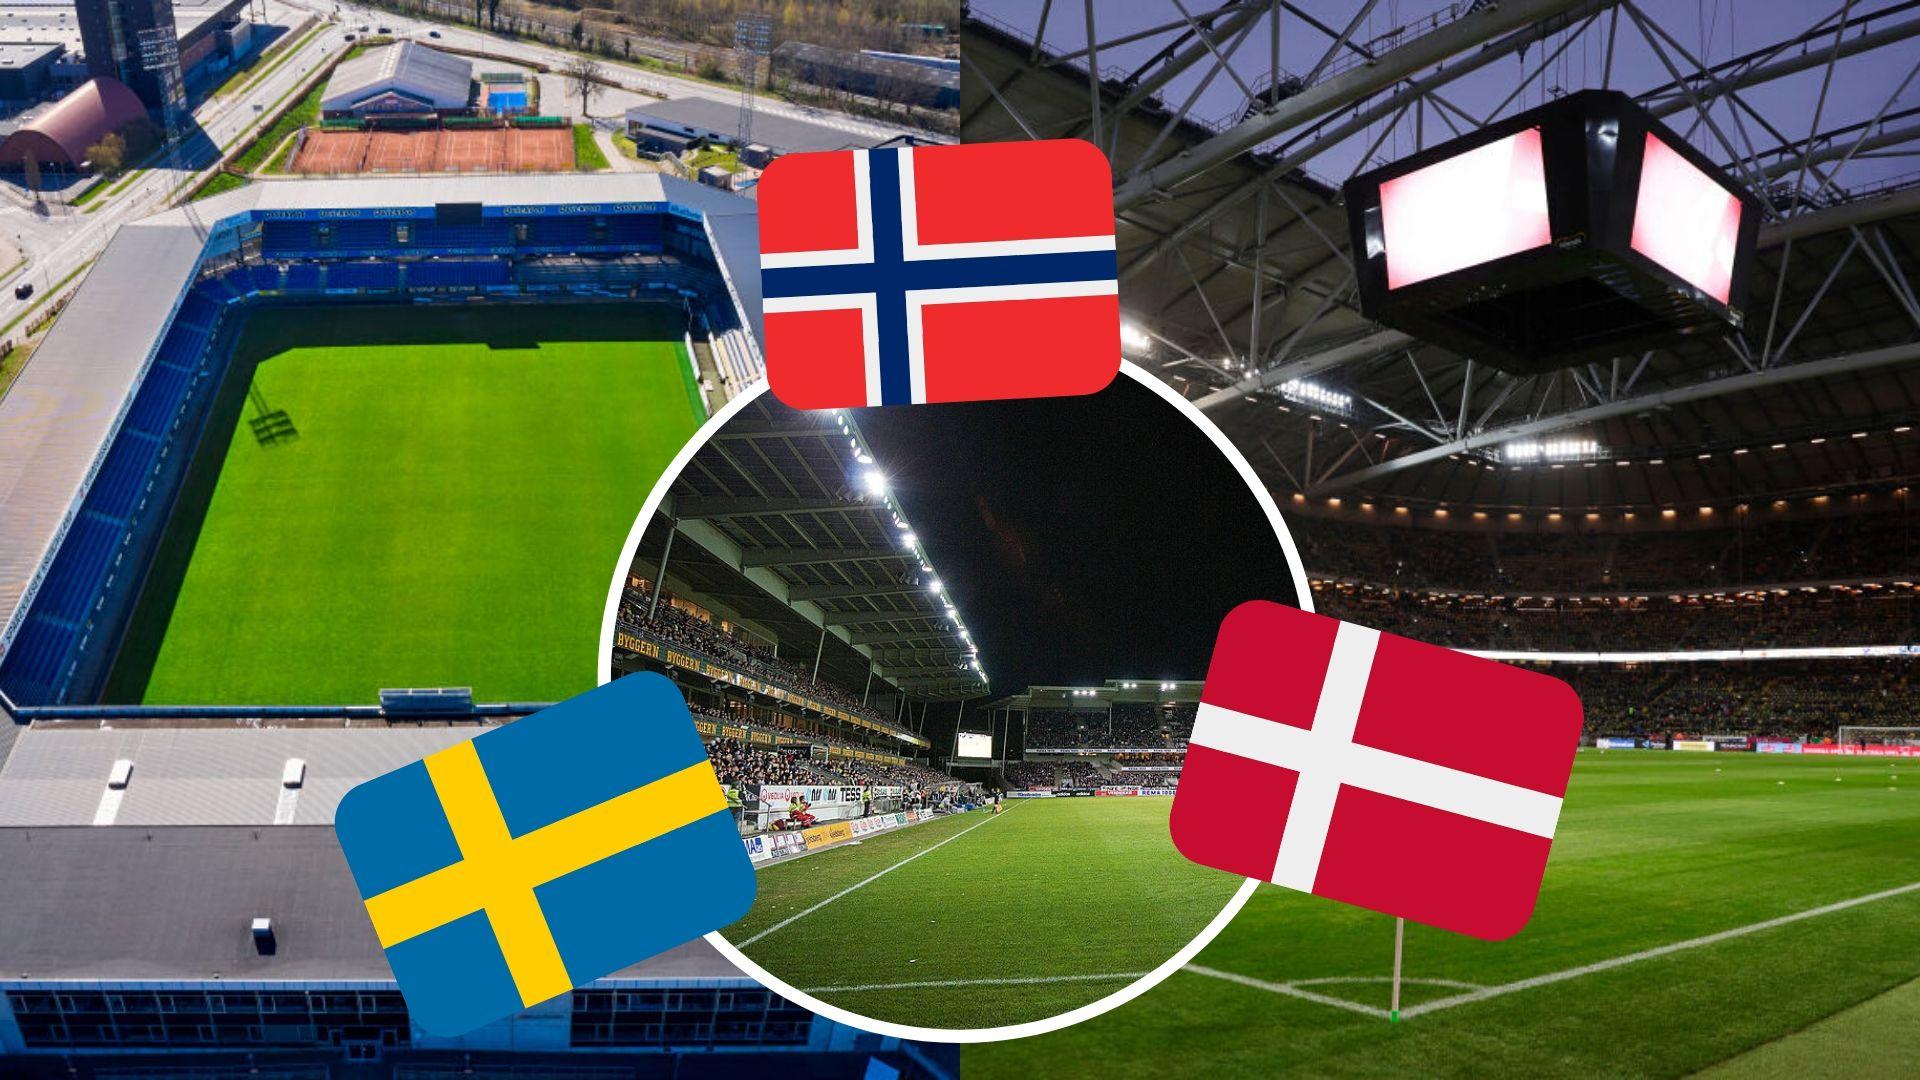 Scandinavia Stadiums